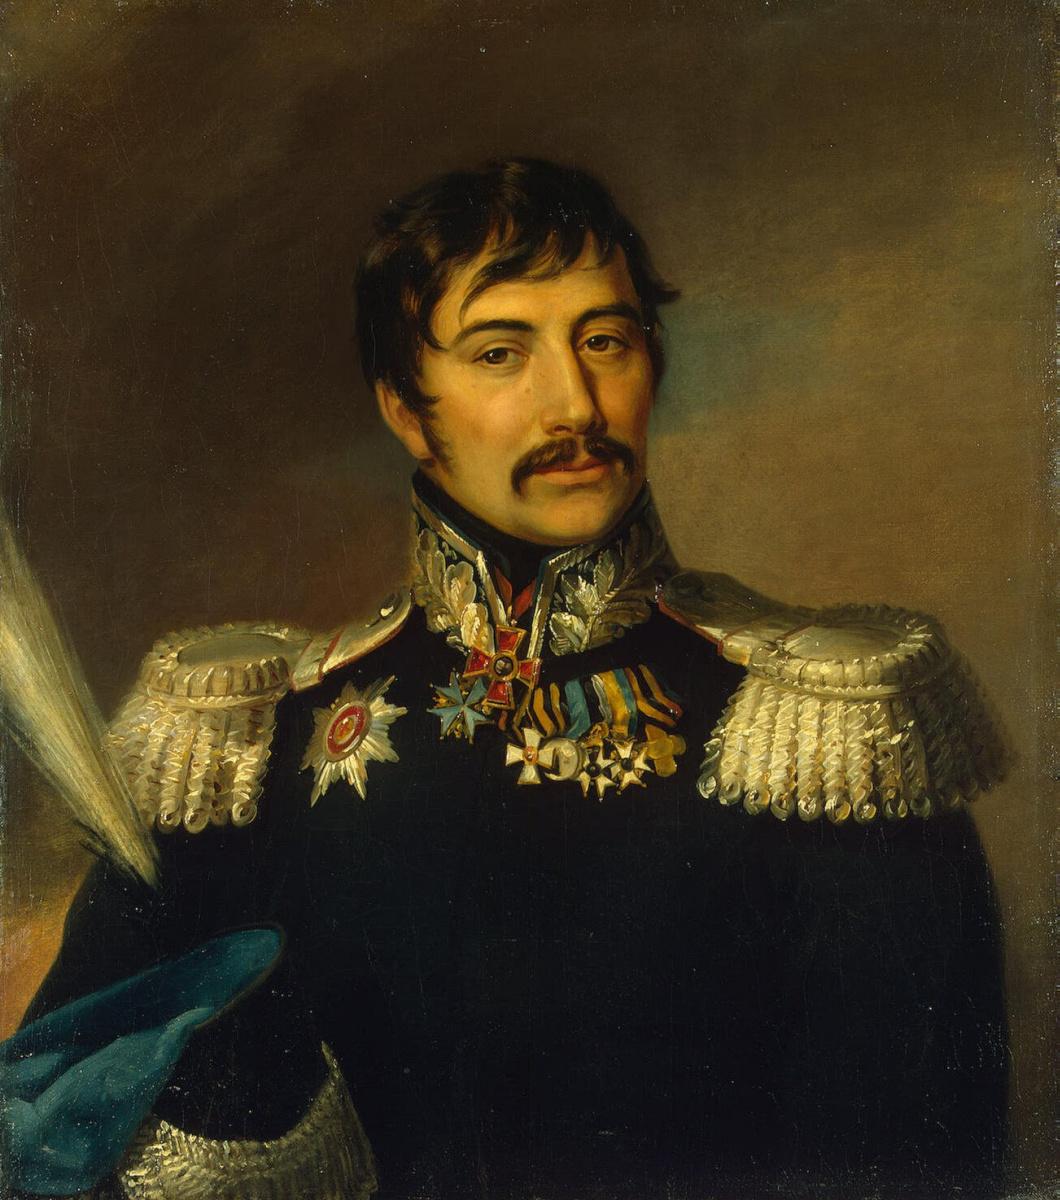 Джордж Доу. Портрет Тимофея Дмитриевича Грекова